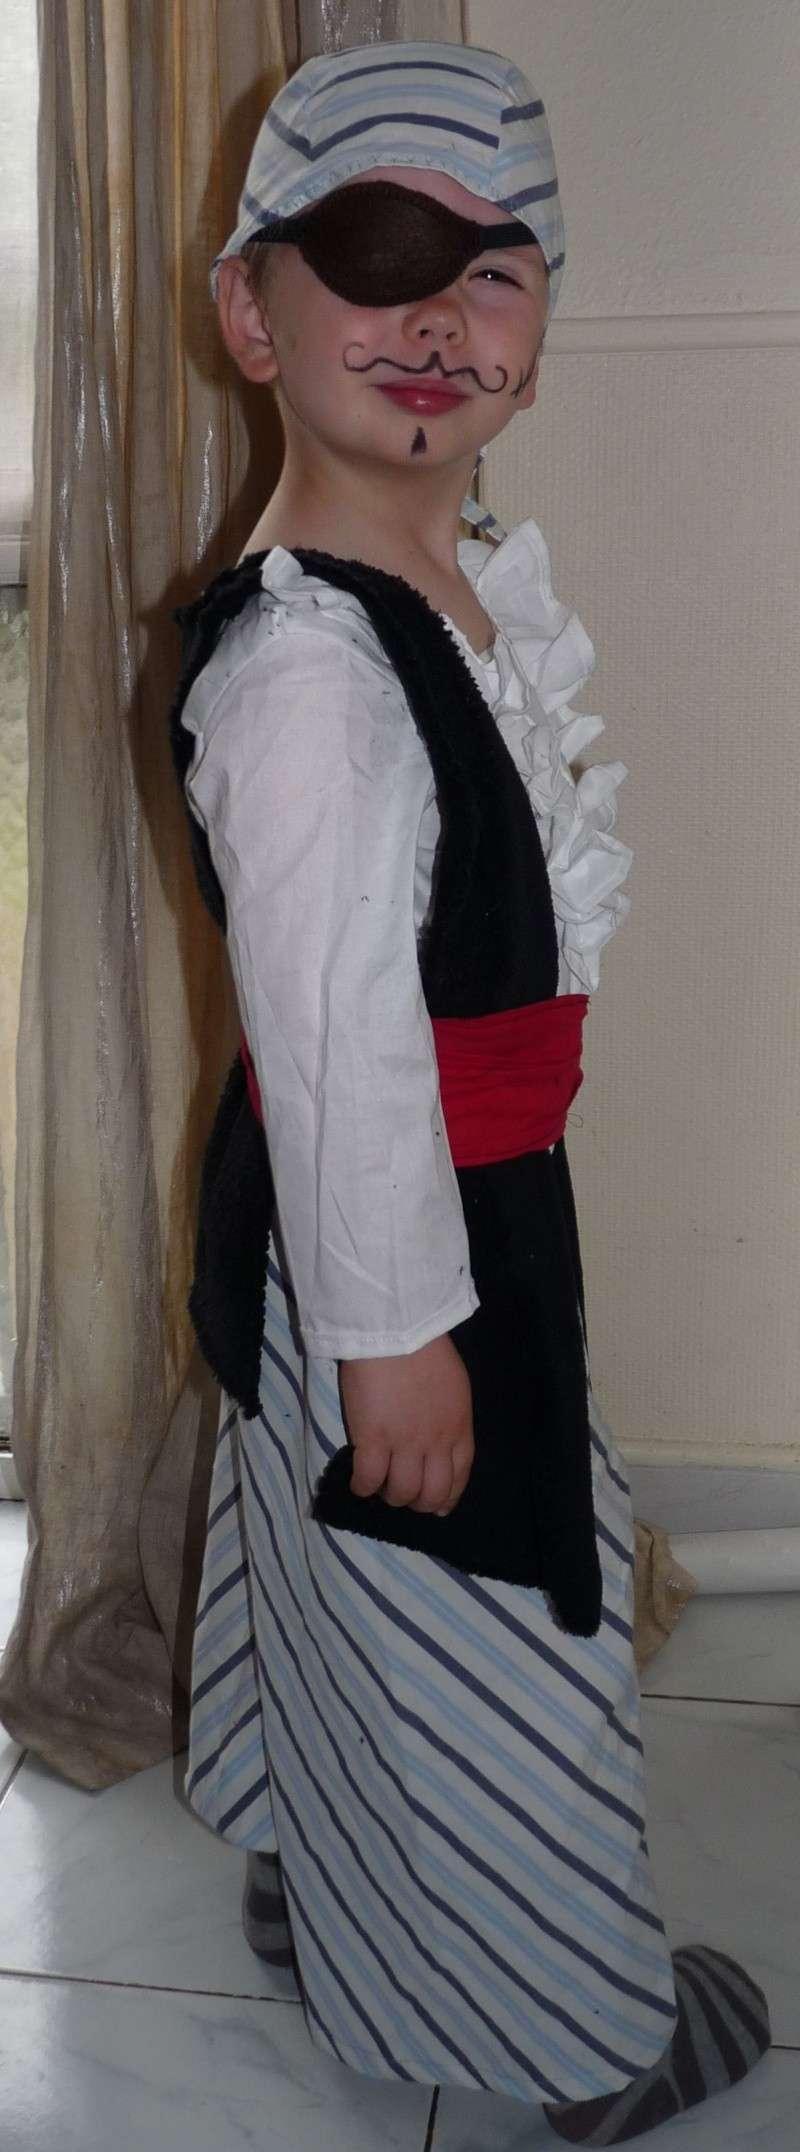 pirate12 dans Couture